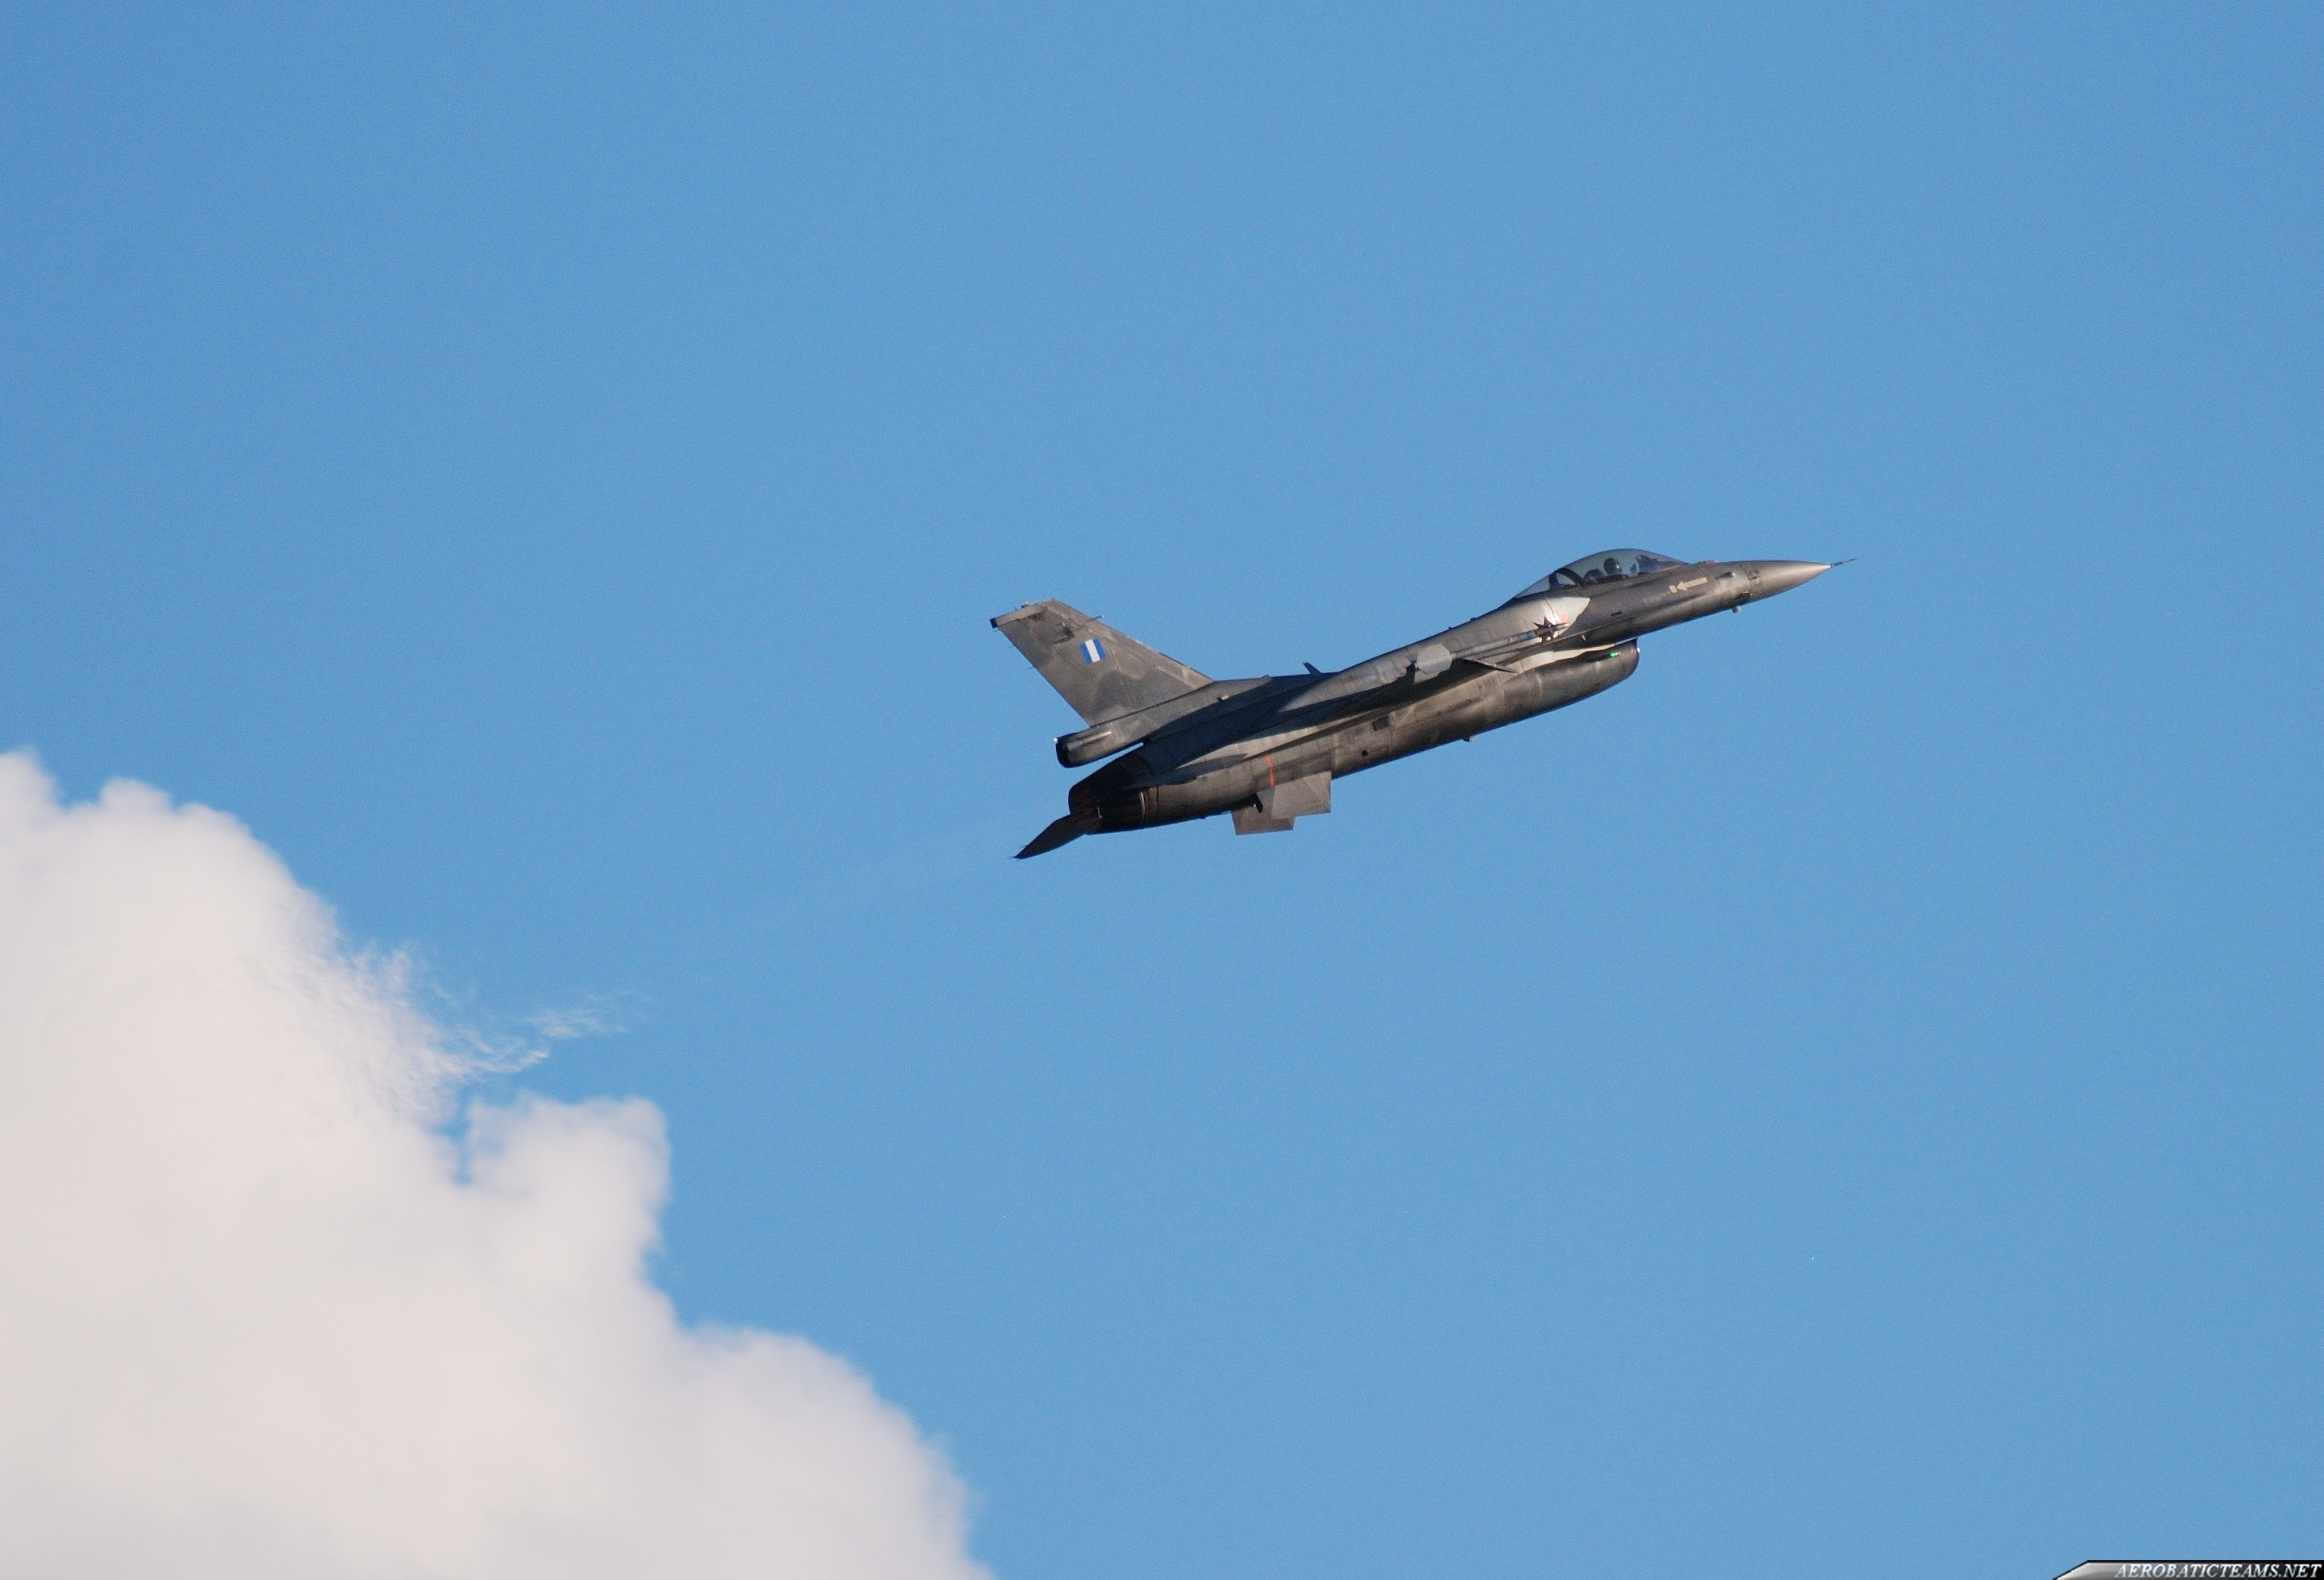 Hellenic Air Force F-16A Block 52+